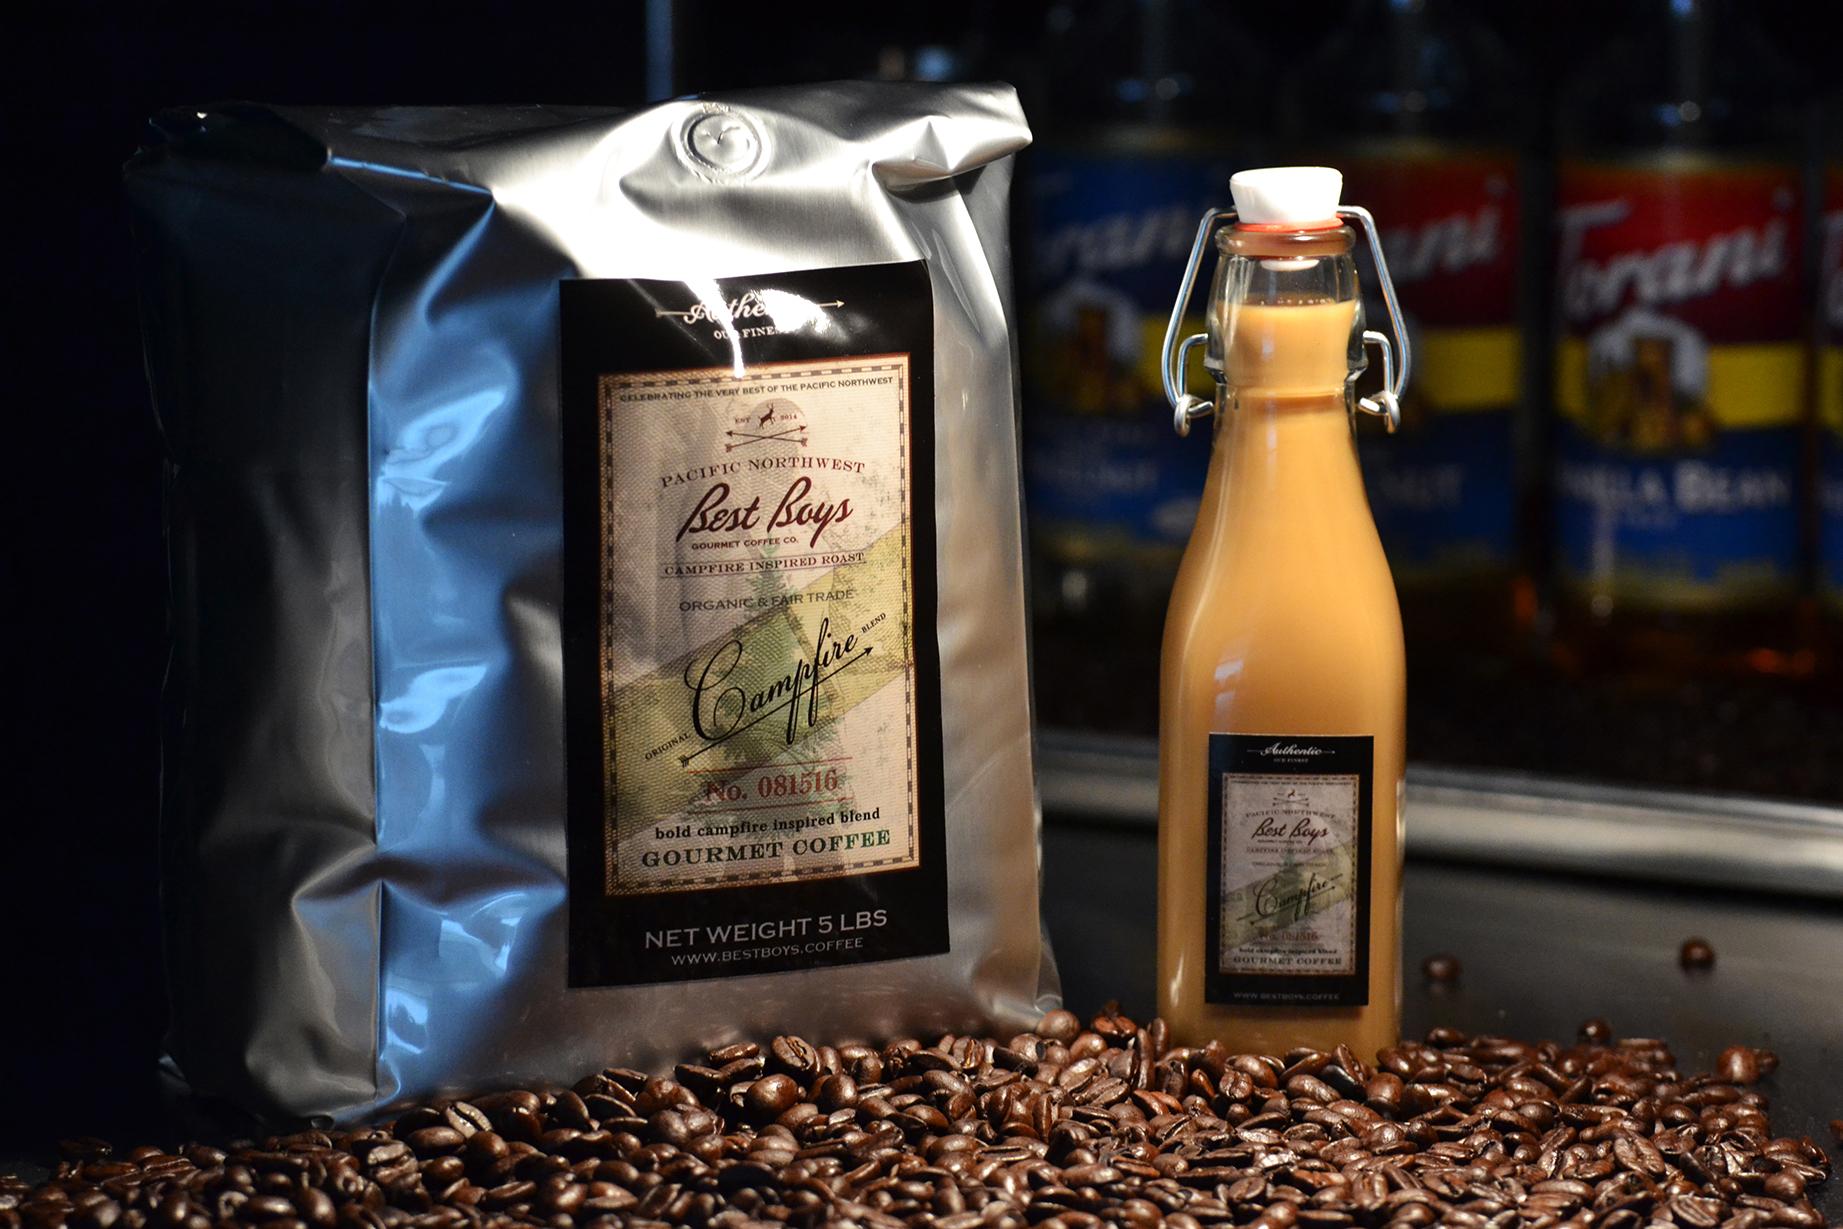 _0691 Best Boys Coffee [at 144 70] Cold Brew by Graham Hnedak Brand G Creative 13 OCT 2016.jpg